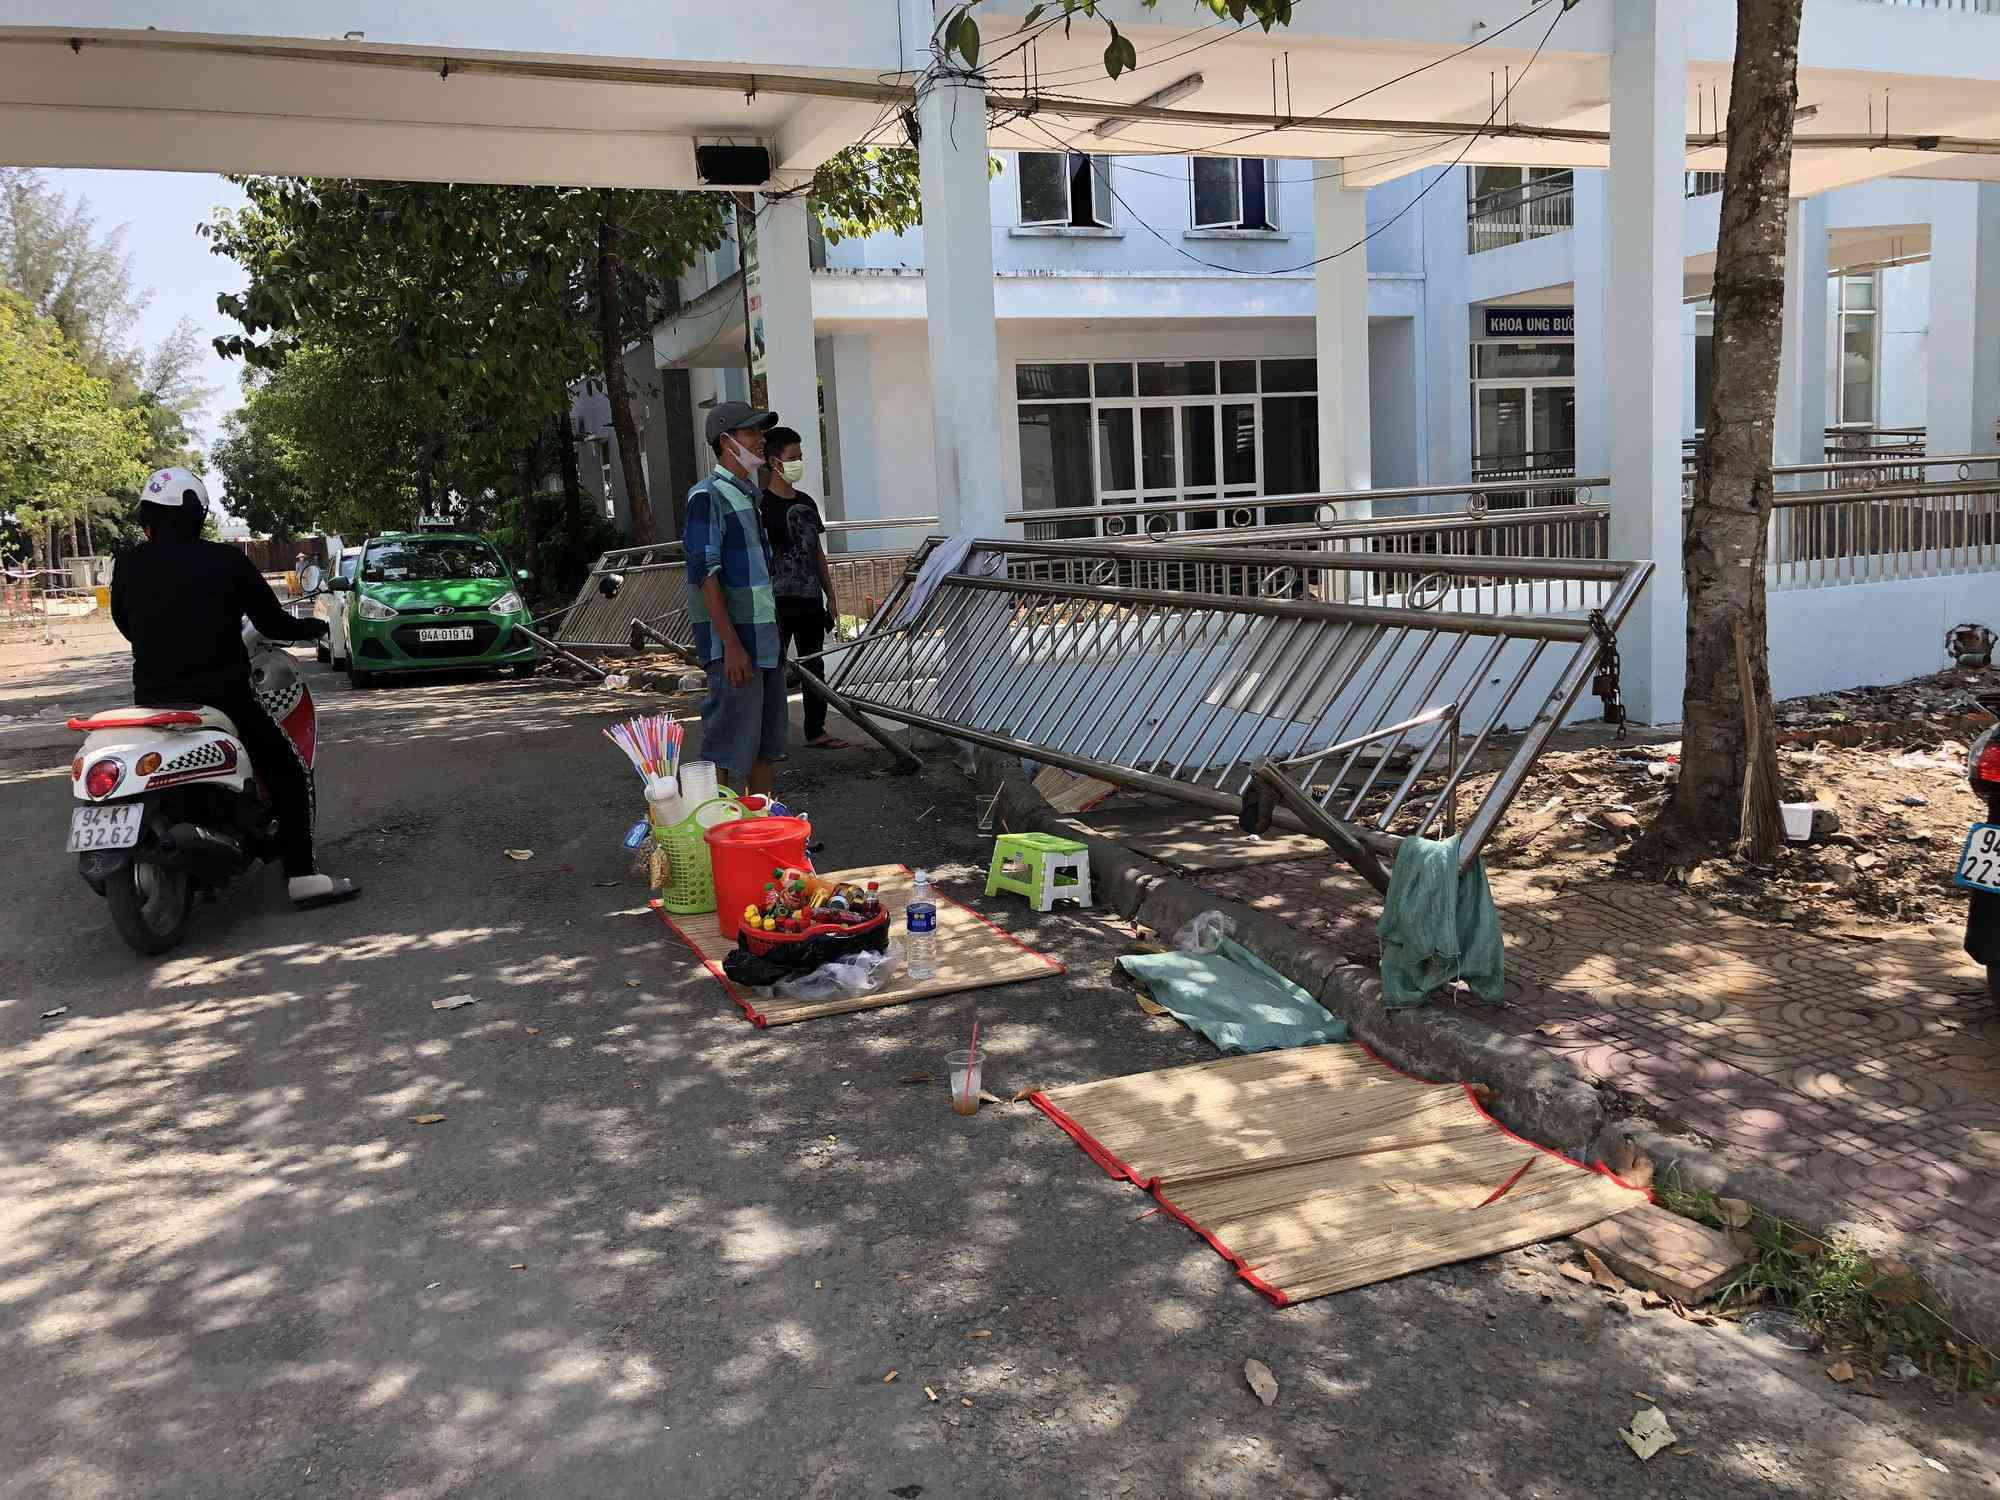 nguoi ban hang rong chi mat 20 giay de vao khu cach ly covid-19 benh vien da khoa bac lieu - 3